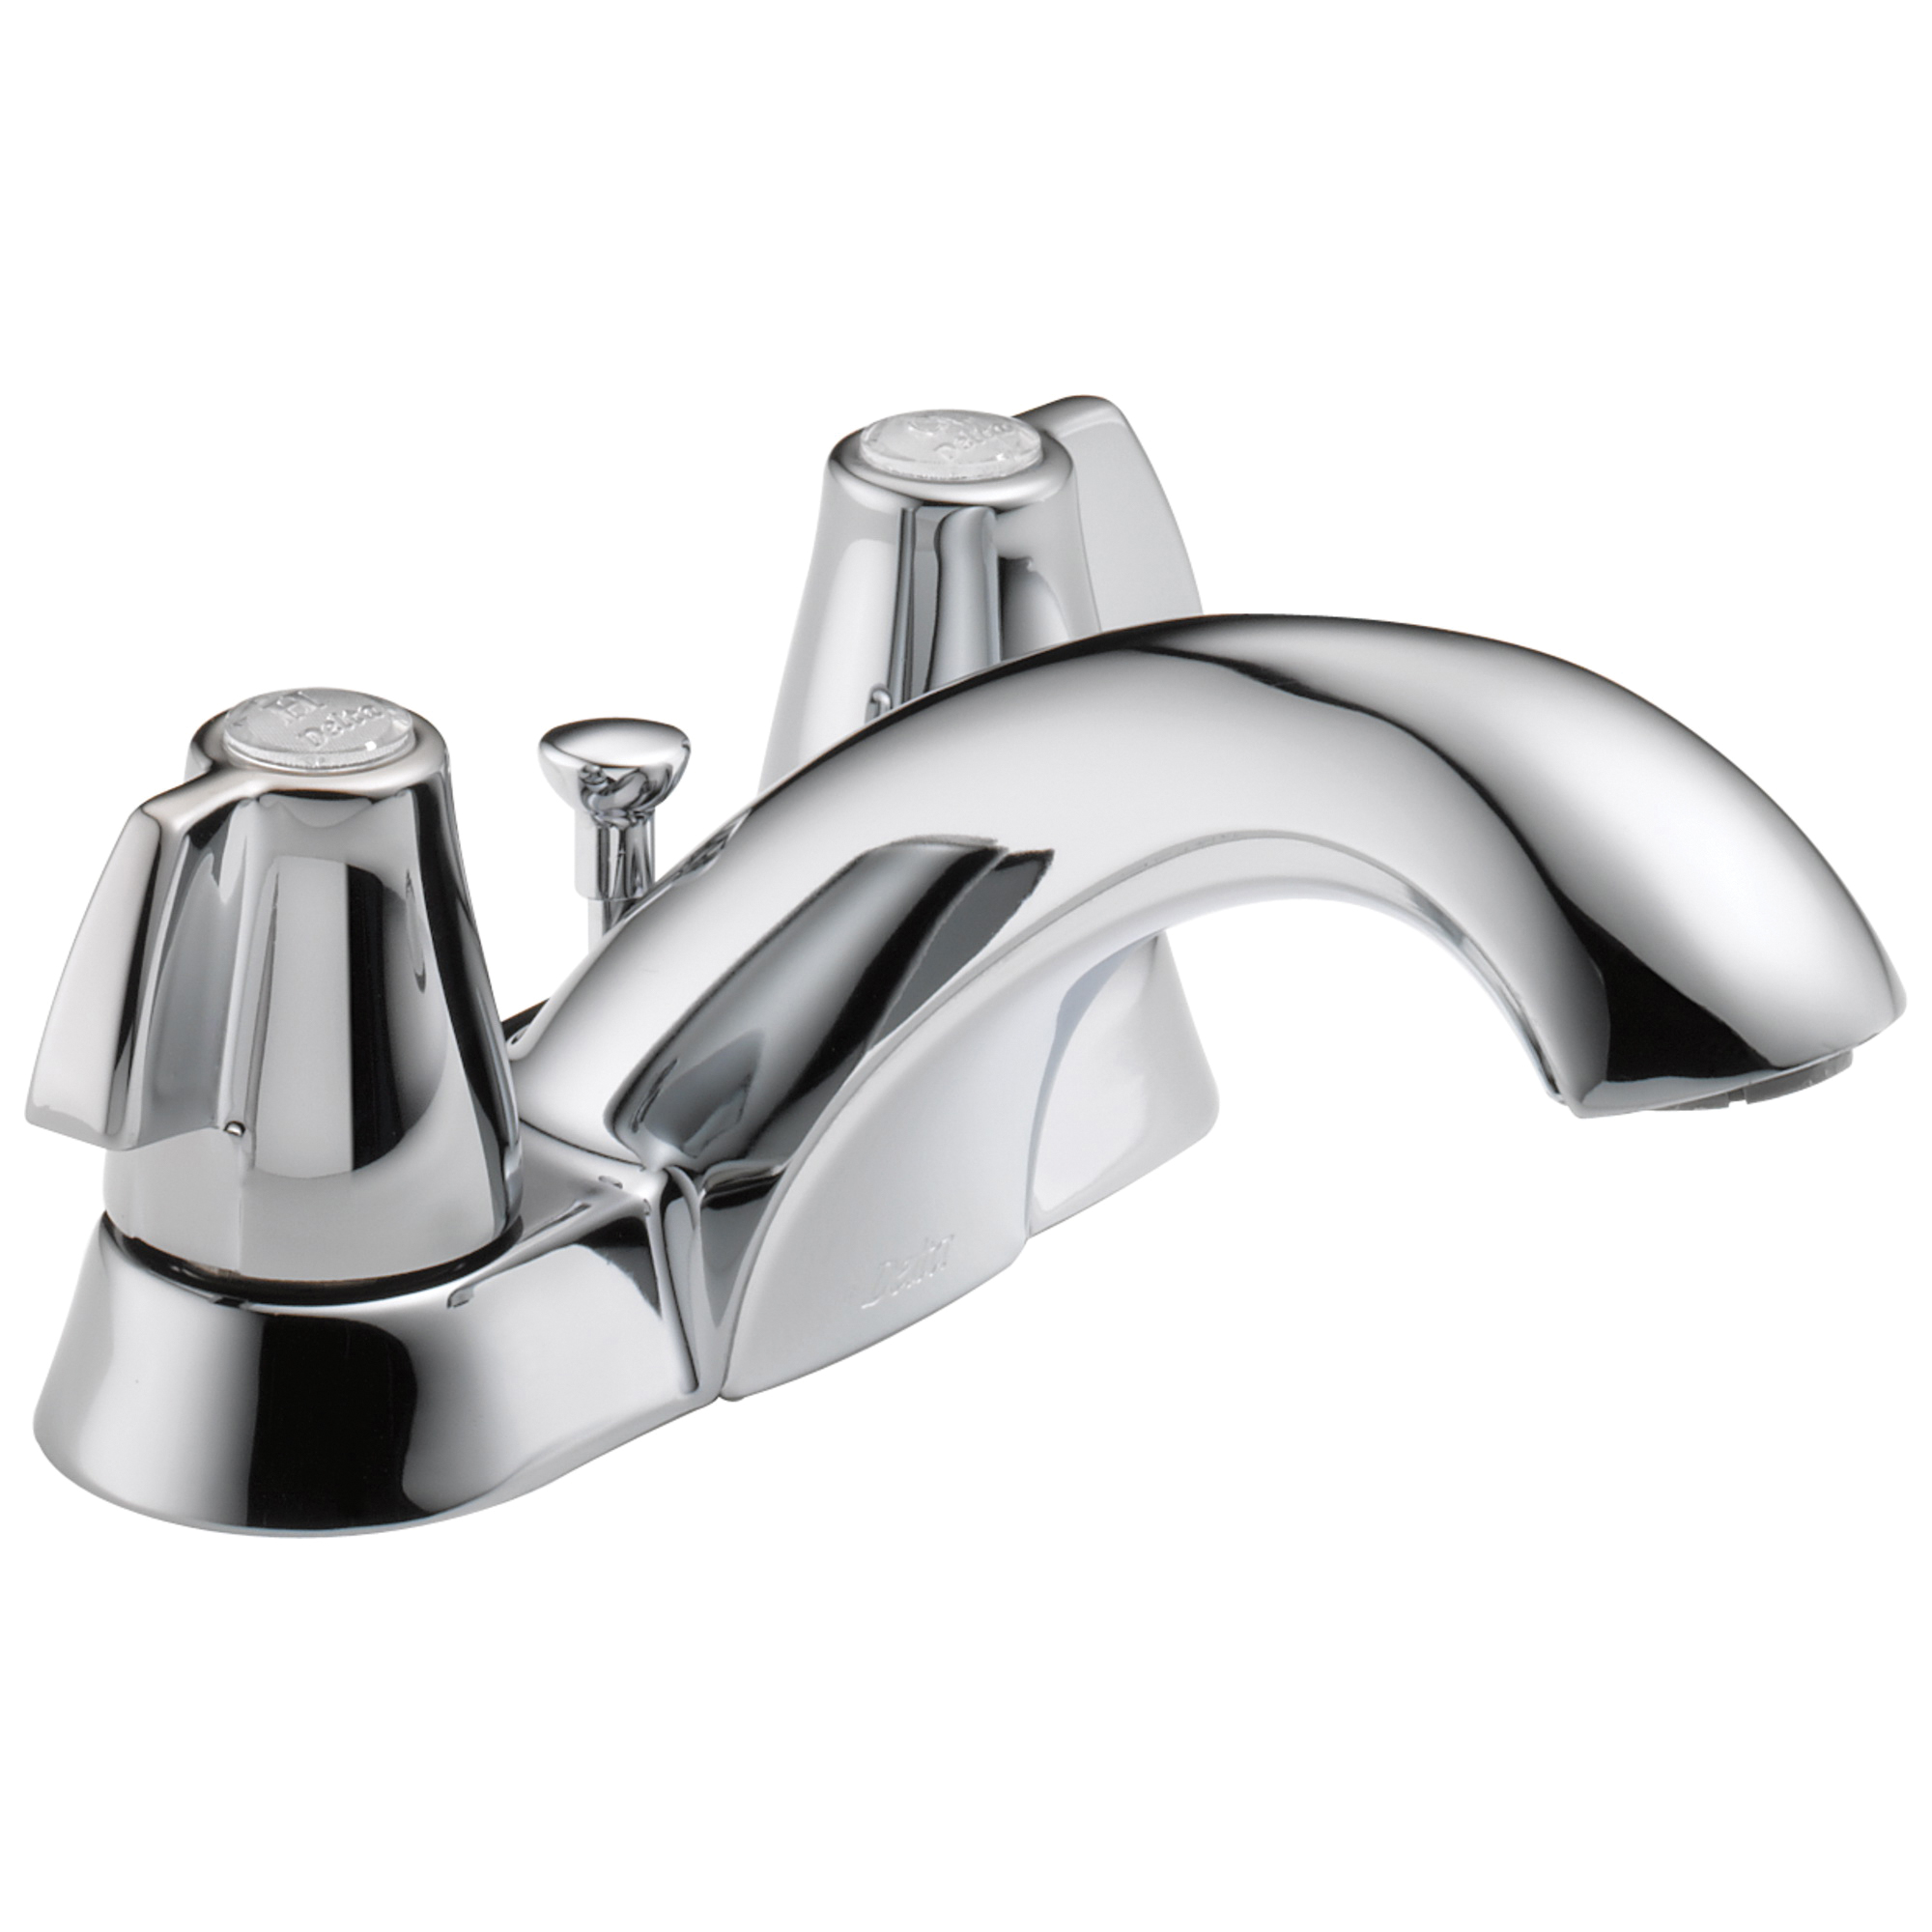 DELTA® 2520LF-MPU Centerset Lavatory Faucet, Classic, Chrome Plated, 2 Handles, Metal Pop-Up Drain, 1.2 gpm